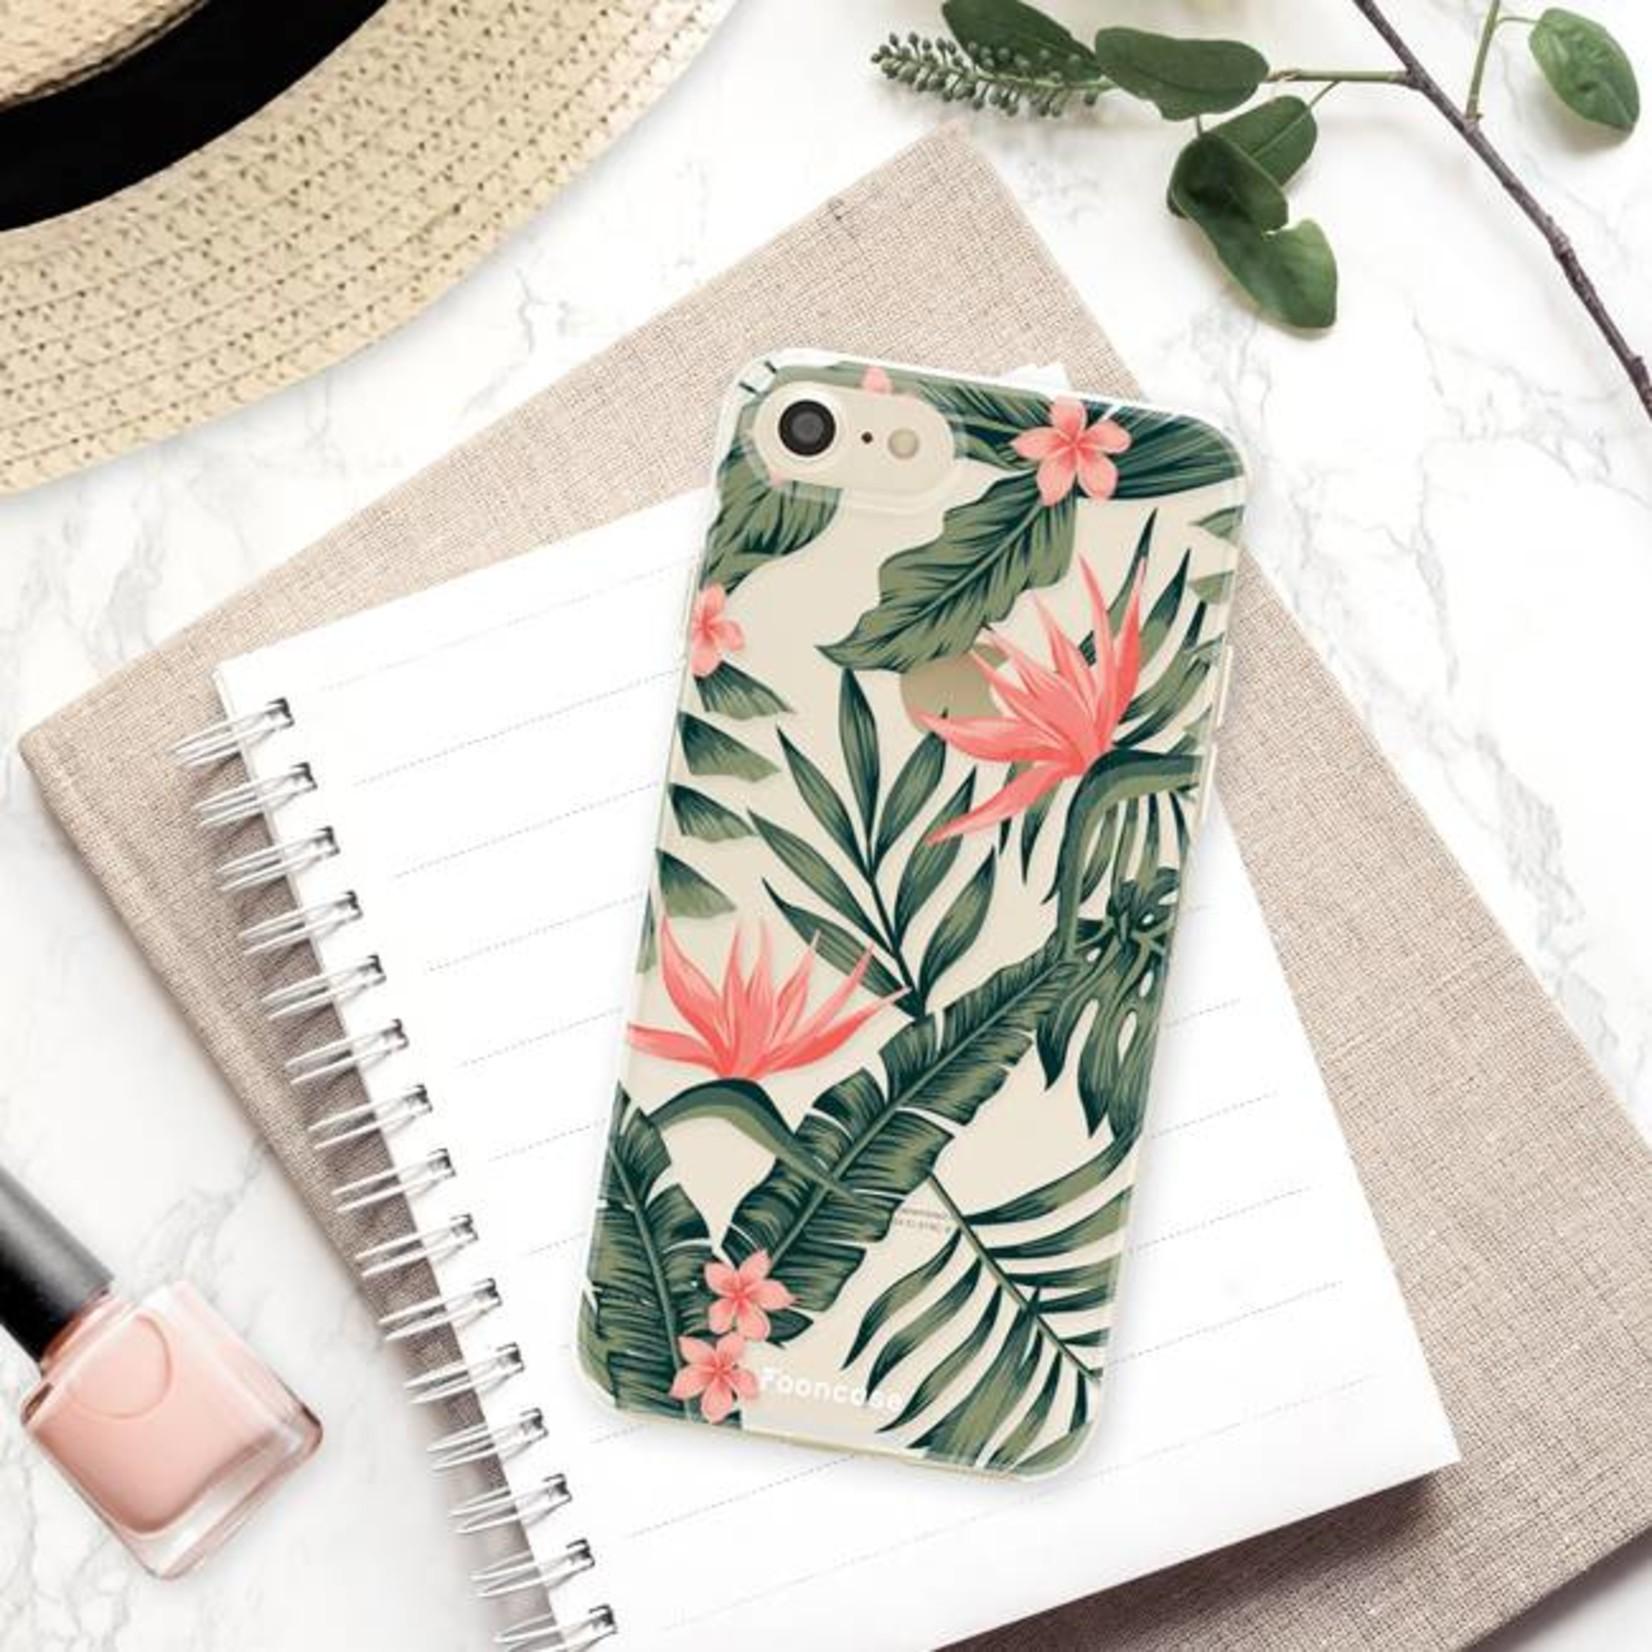 FOONCASE iPhone SE (2020) hoesje TPU Soft Case - Back Cover - Tropical Desire / Bladeren / Roze